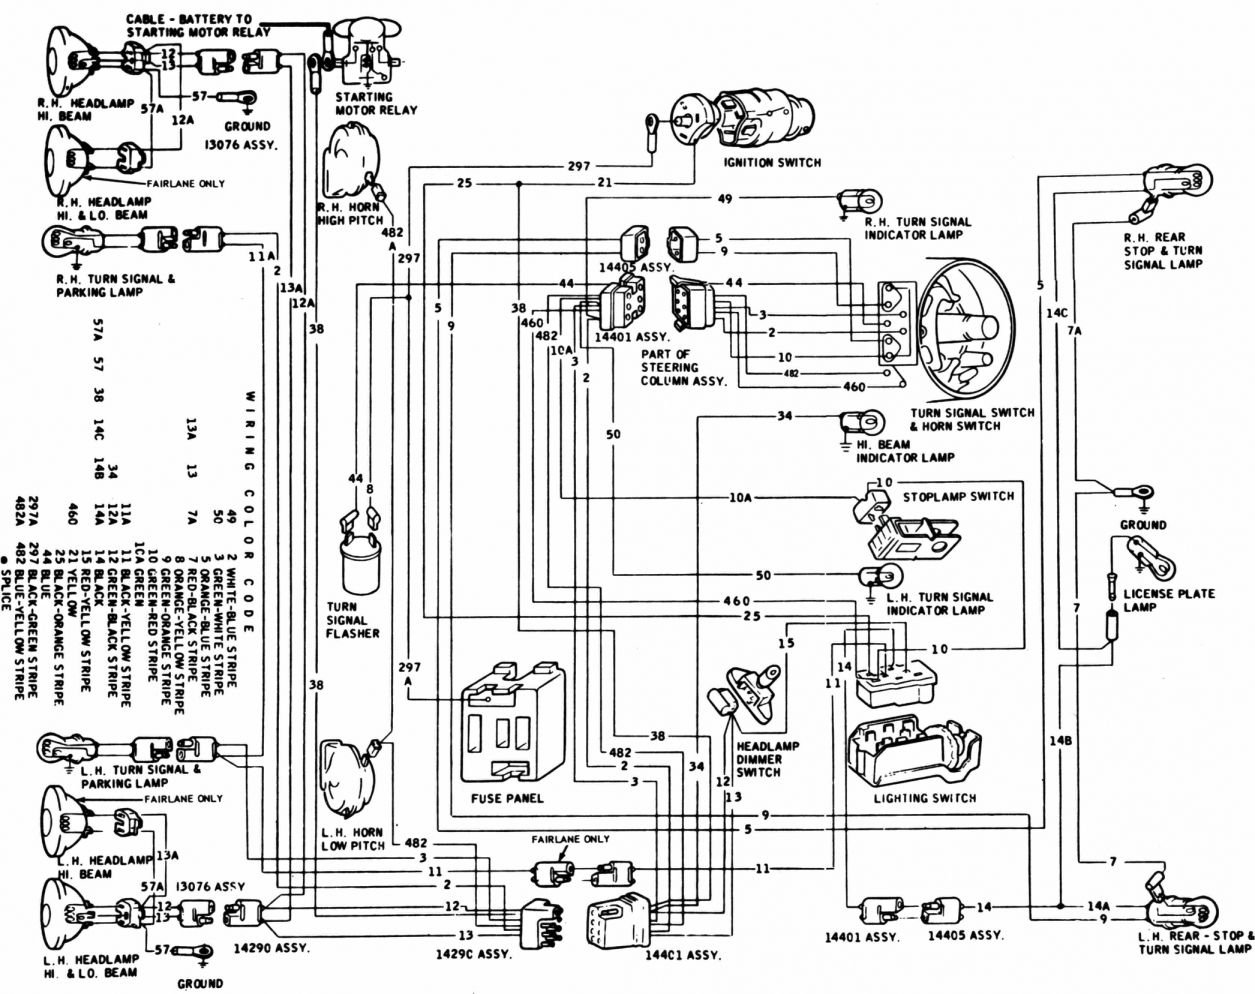 67 Mustang Engine Wiring Diagram And Mustang Engine Diagram Schematics Online En 2020 Mesas De Ordenador Ford